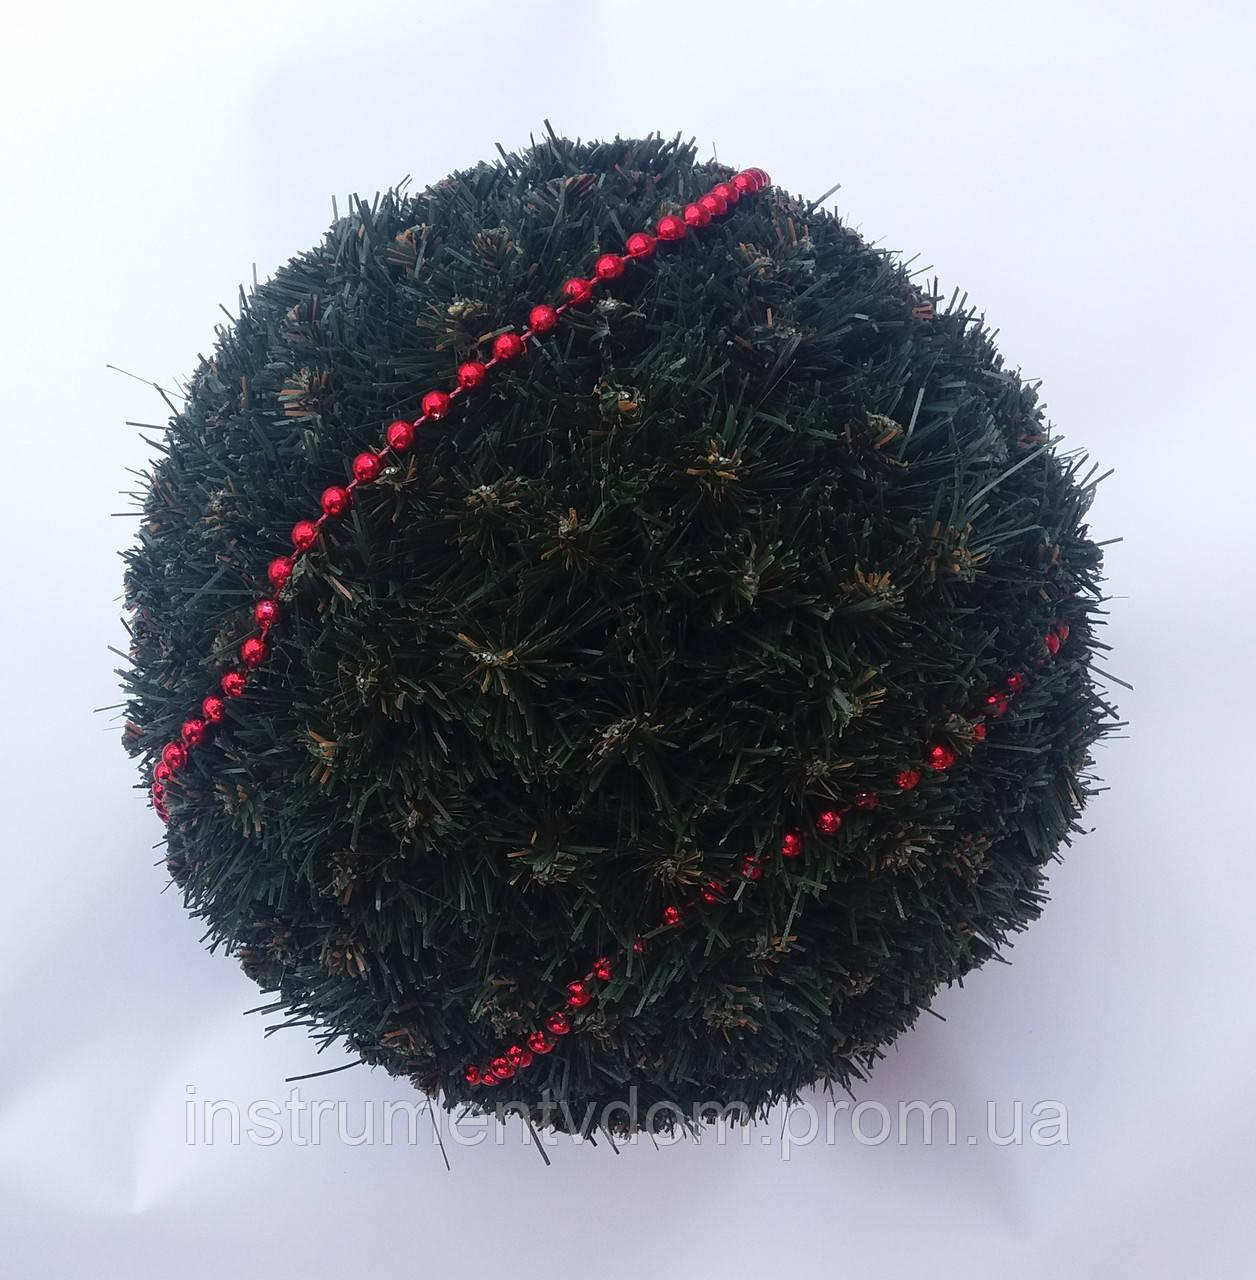 Шар декоративный новогодний из хвои